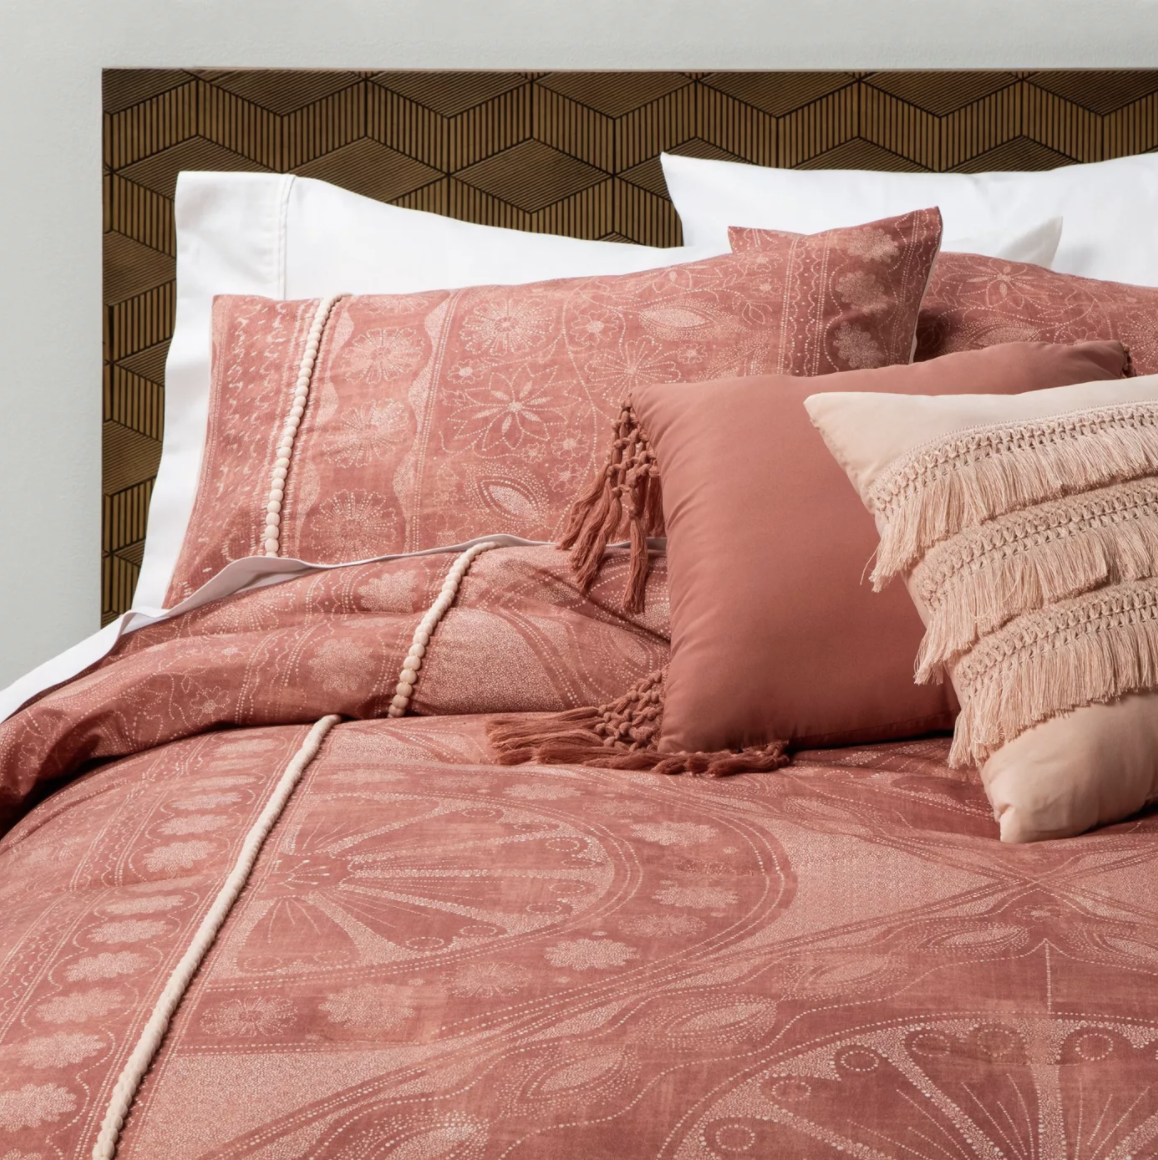 dorm bedding 2021